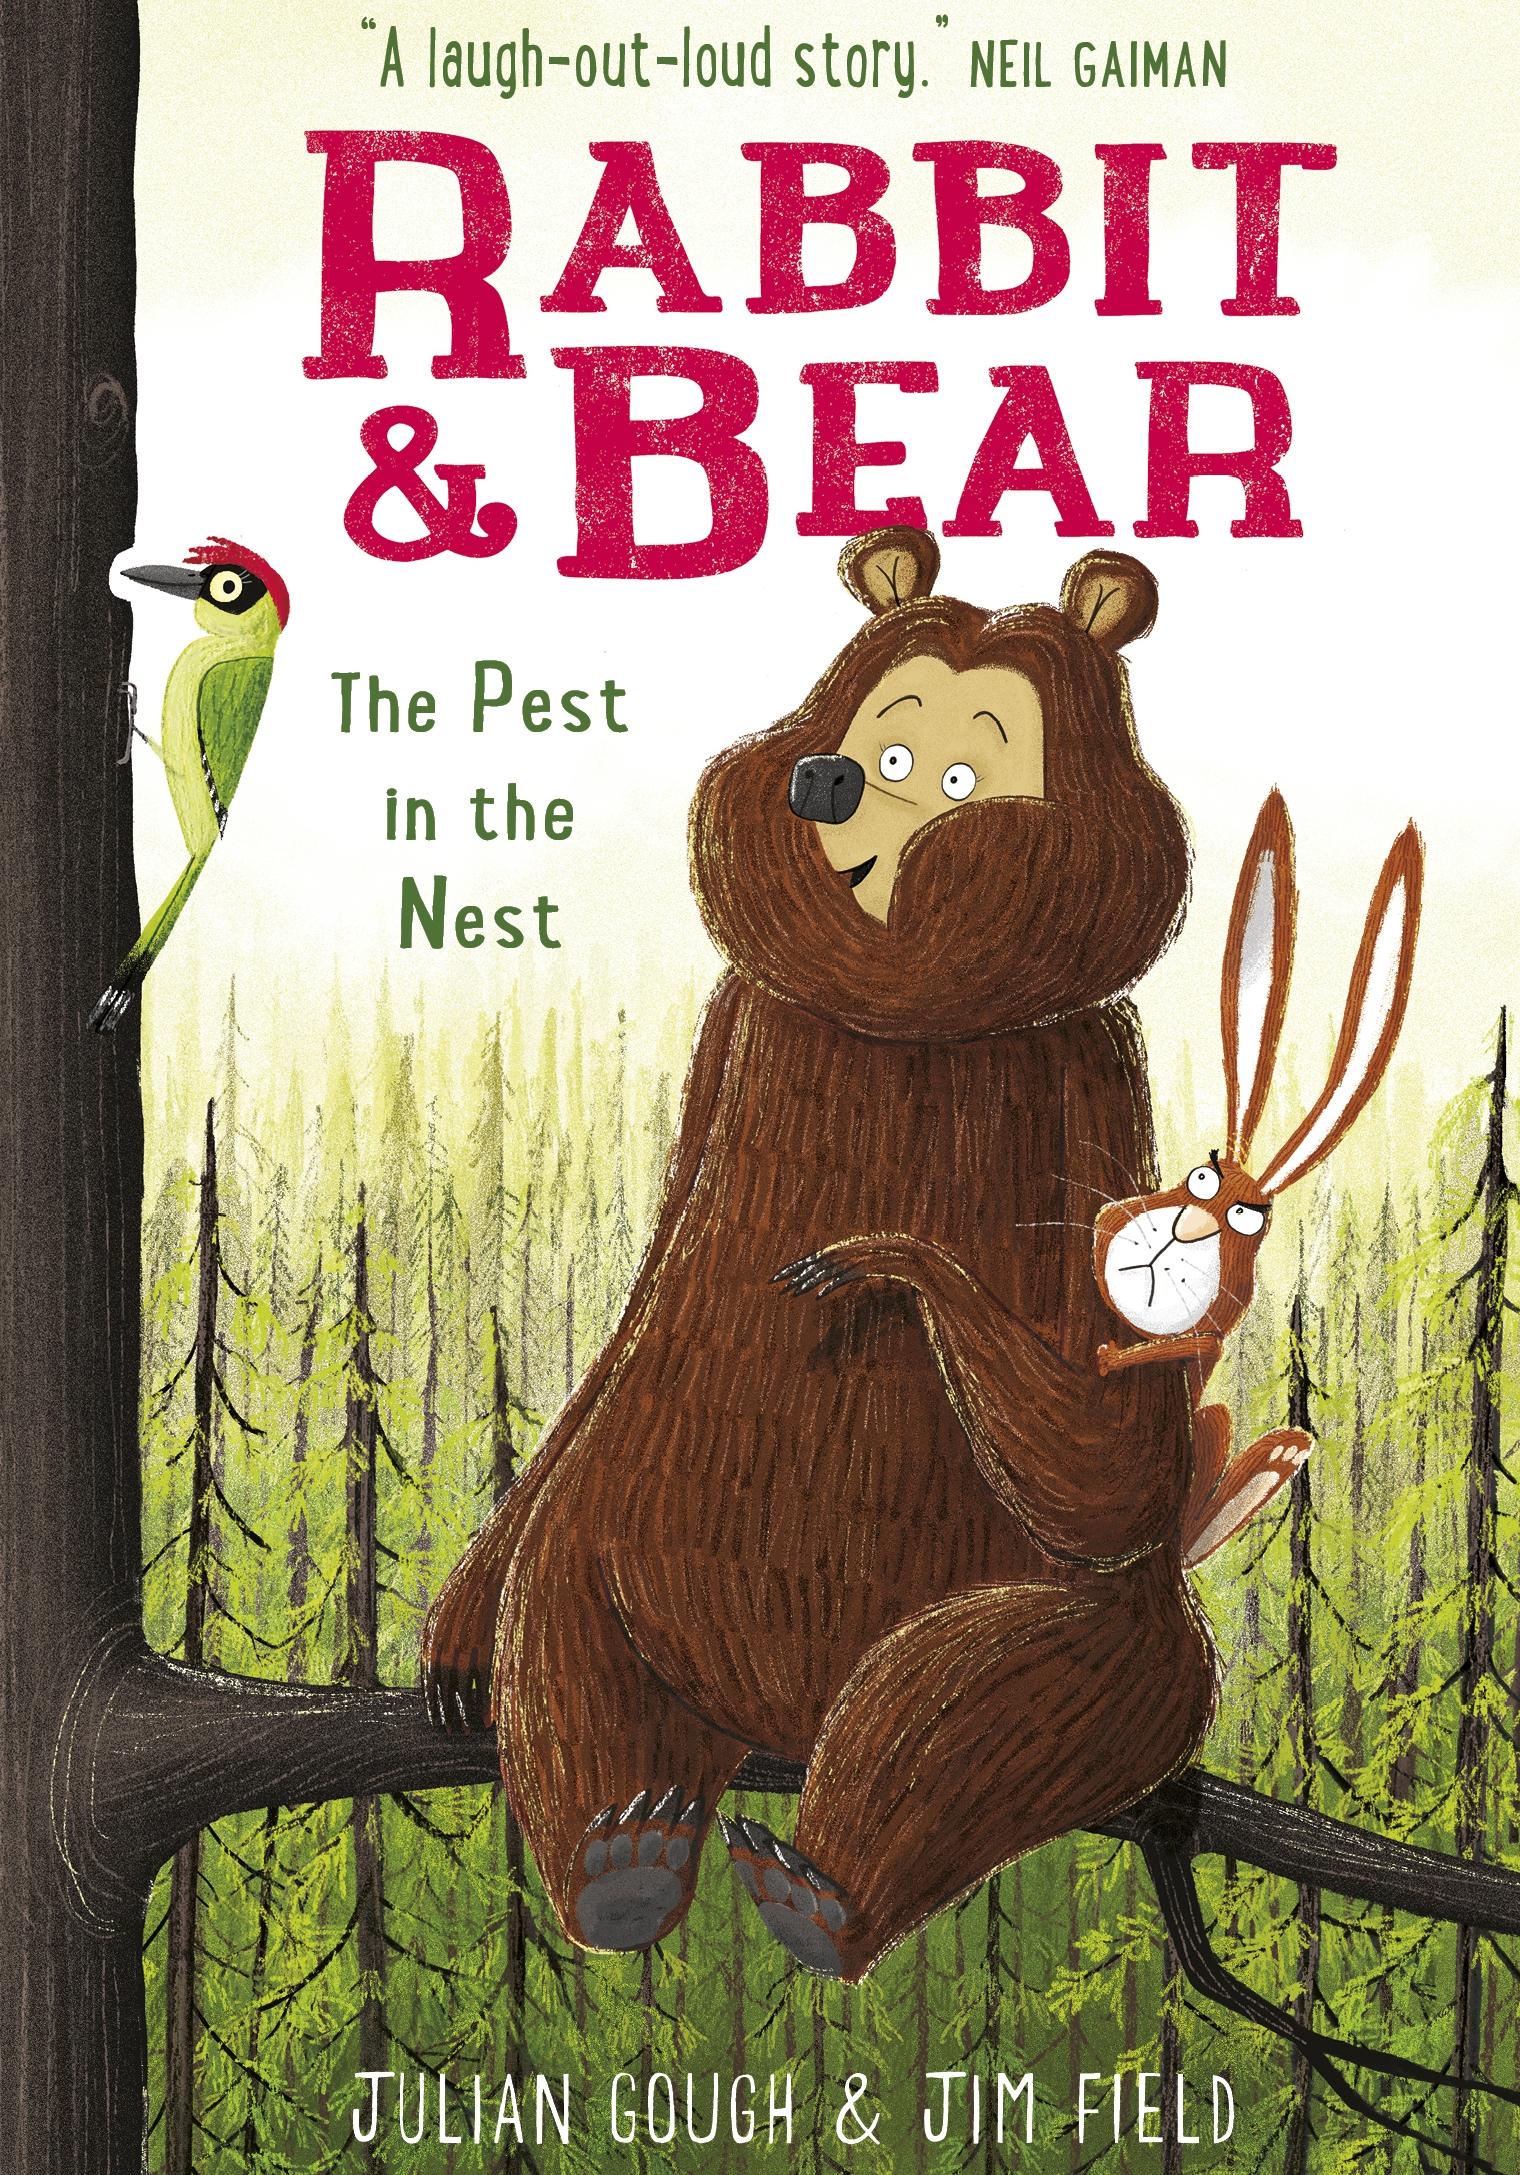 Rabbit-and-Bear-Pest-in-the-Nest.jpg